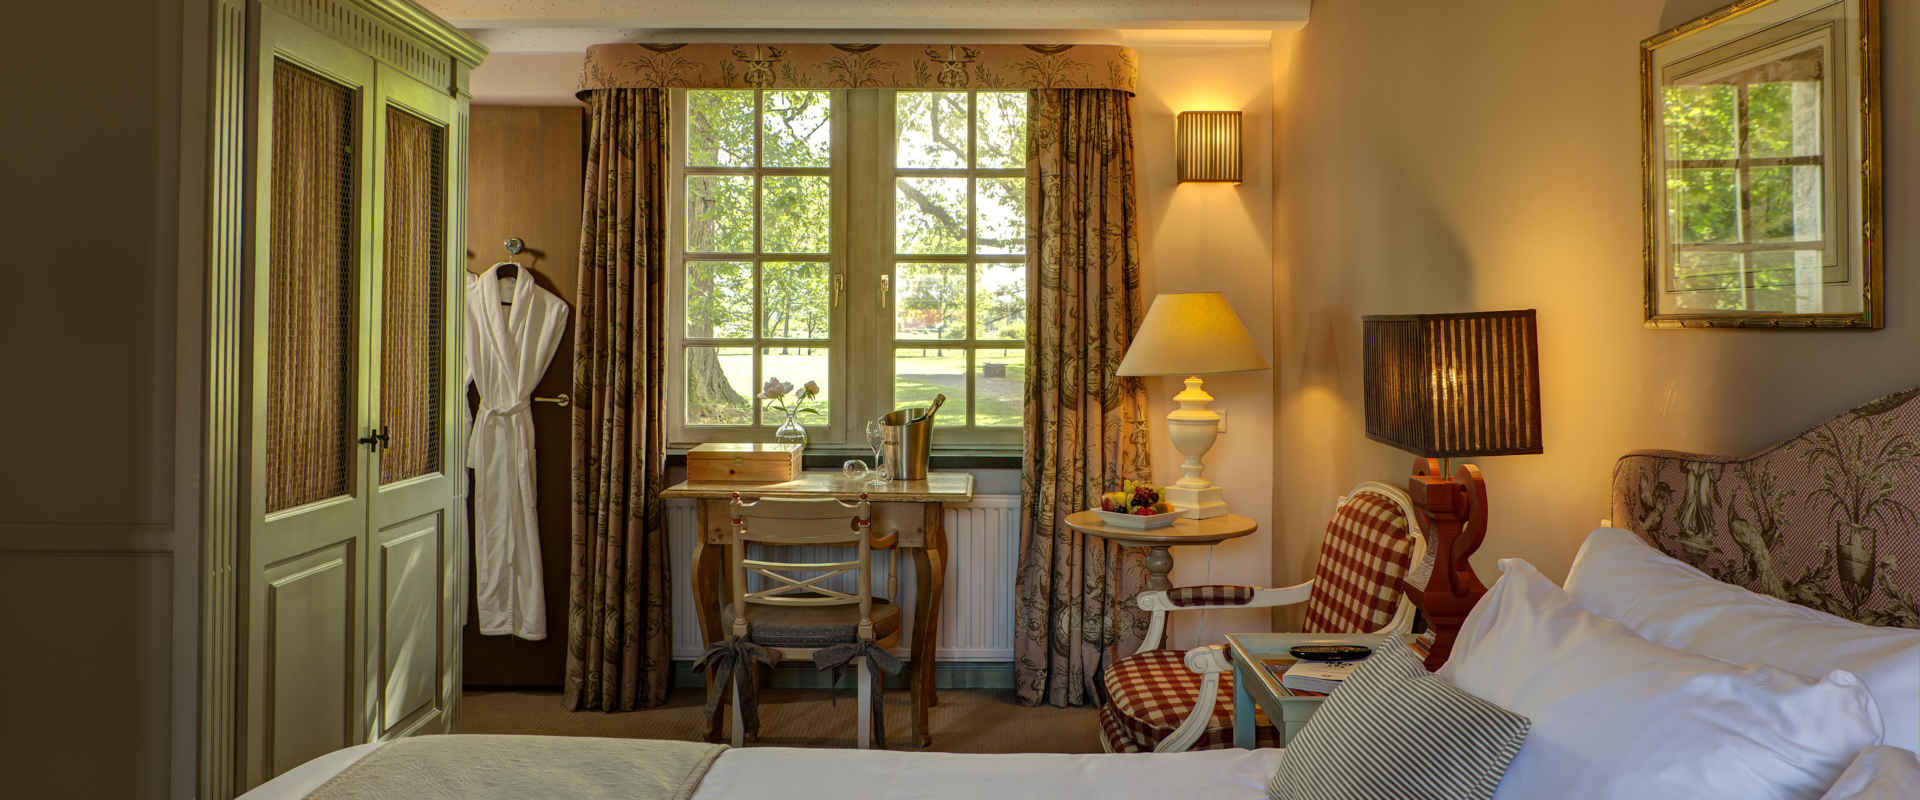 Luxe hotelkamer ch teau st gerlach for Designhotel maastricht comfort xl